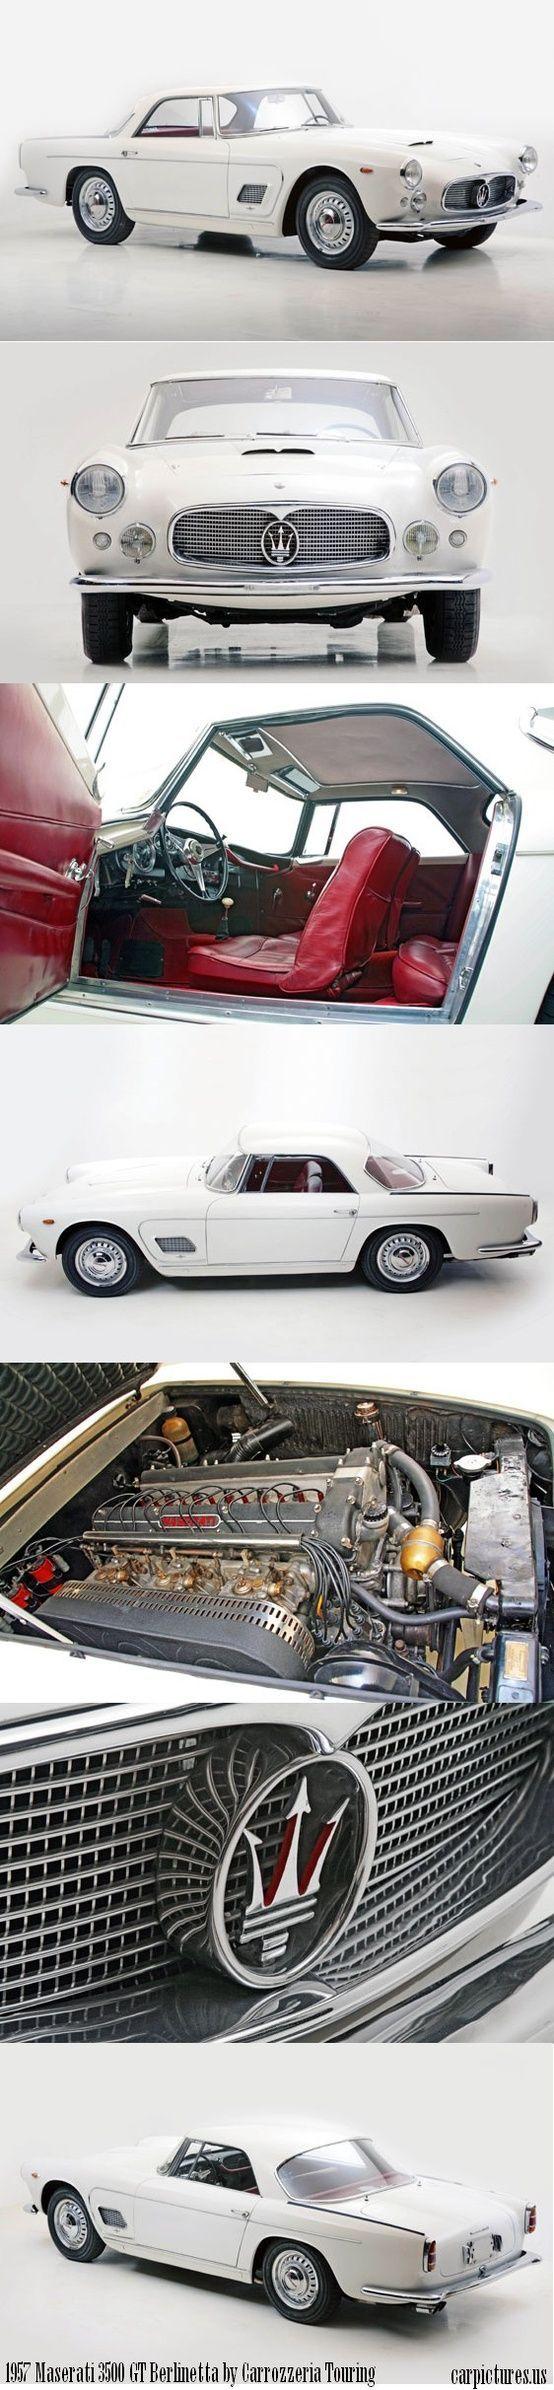 Cool Cars 1957 Maserati 3500 G ~ Aurora Bola Photo Blog - Cool Cars Photo http://danielhotcollection.blogspot.com/ #maseraticlassiccars